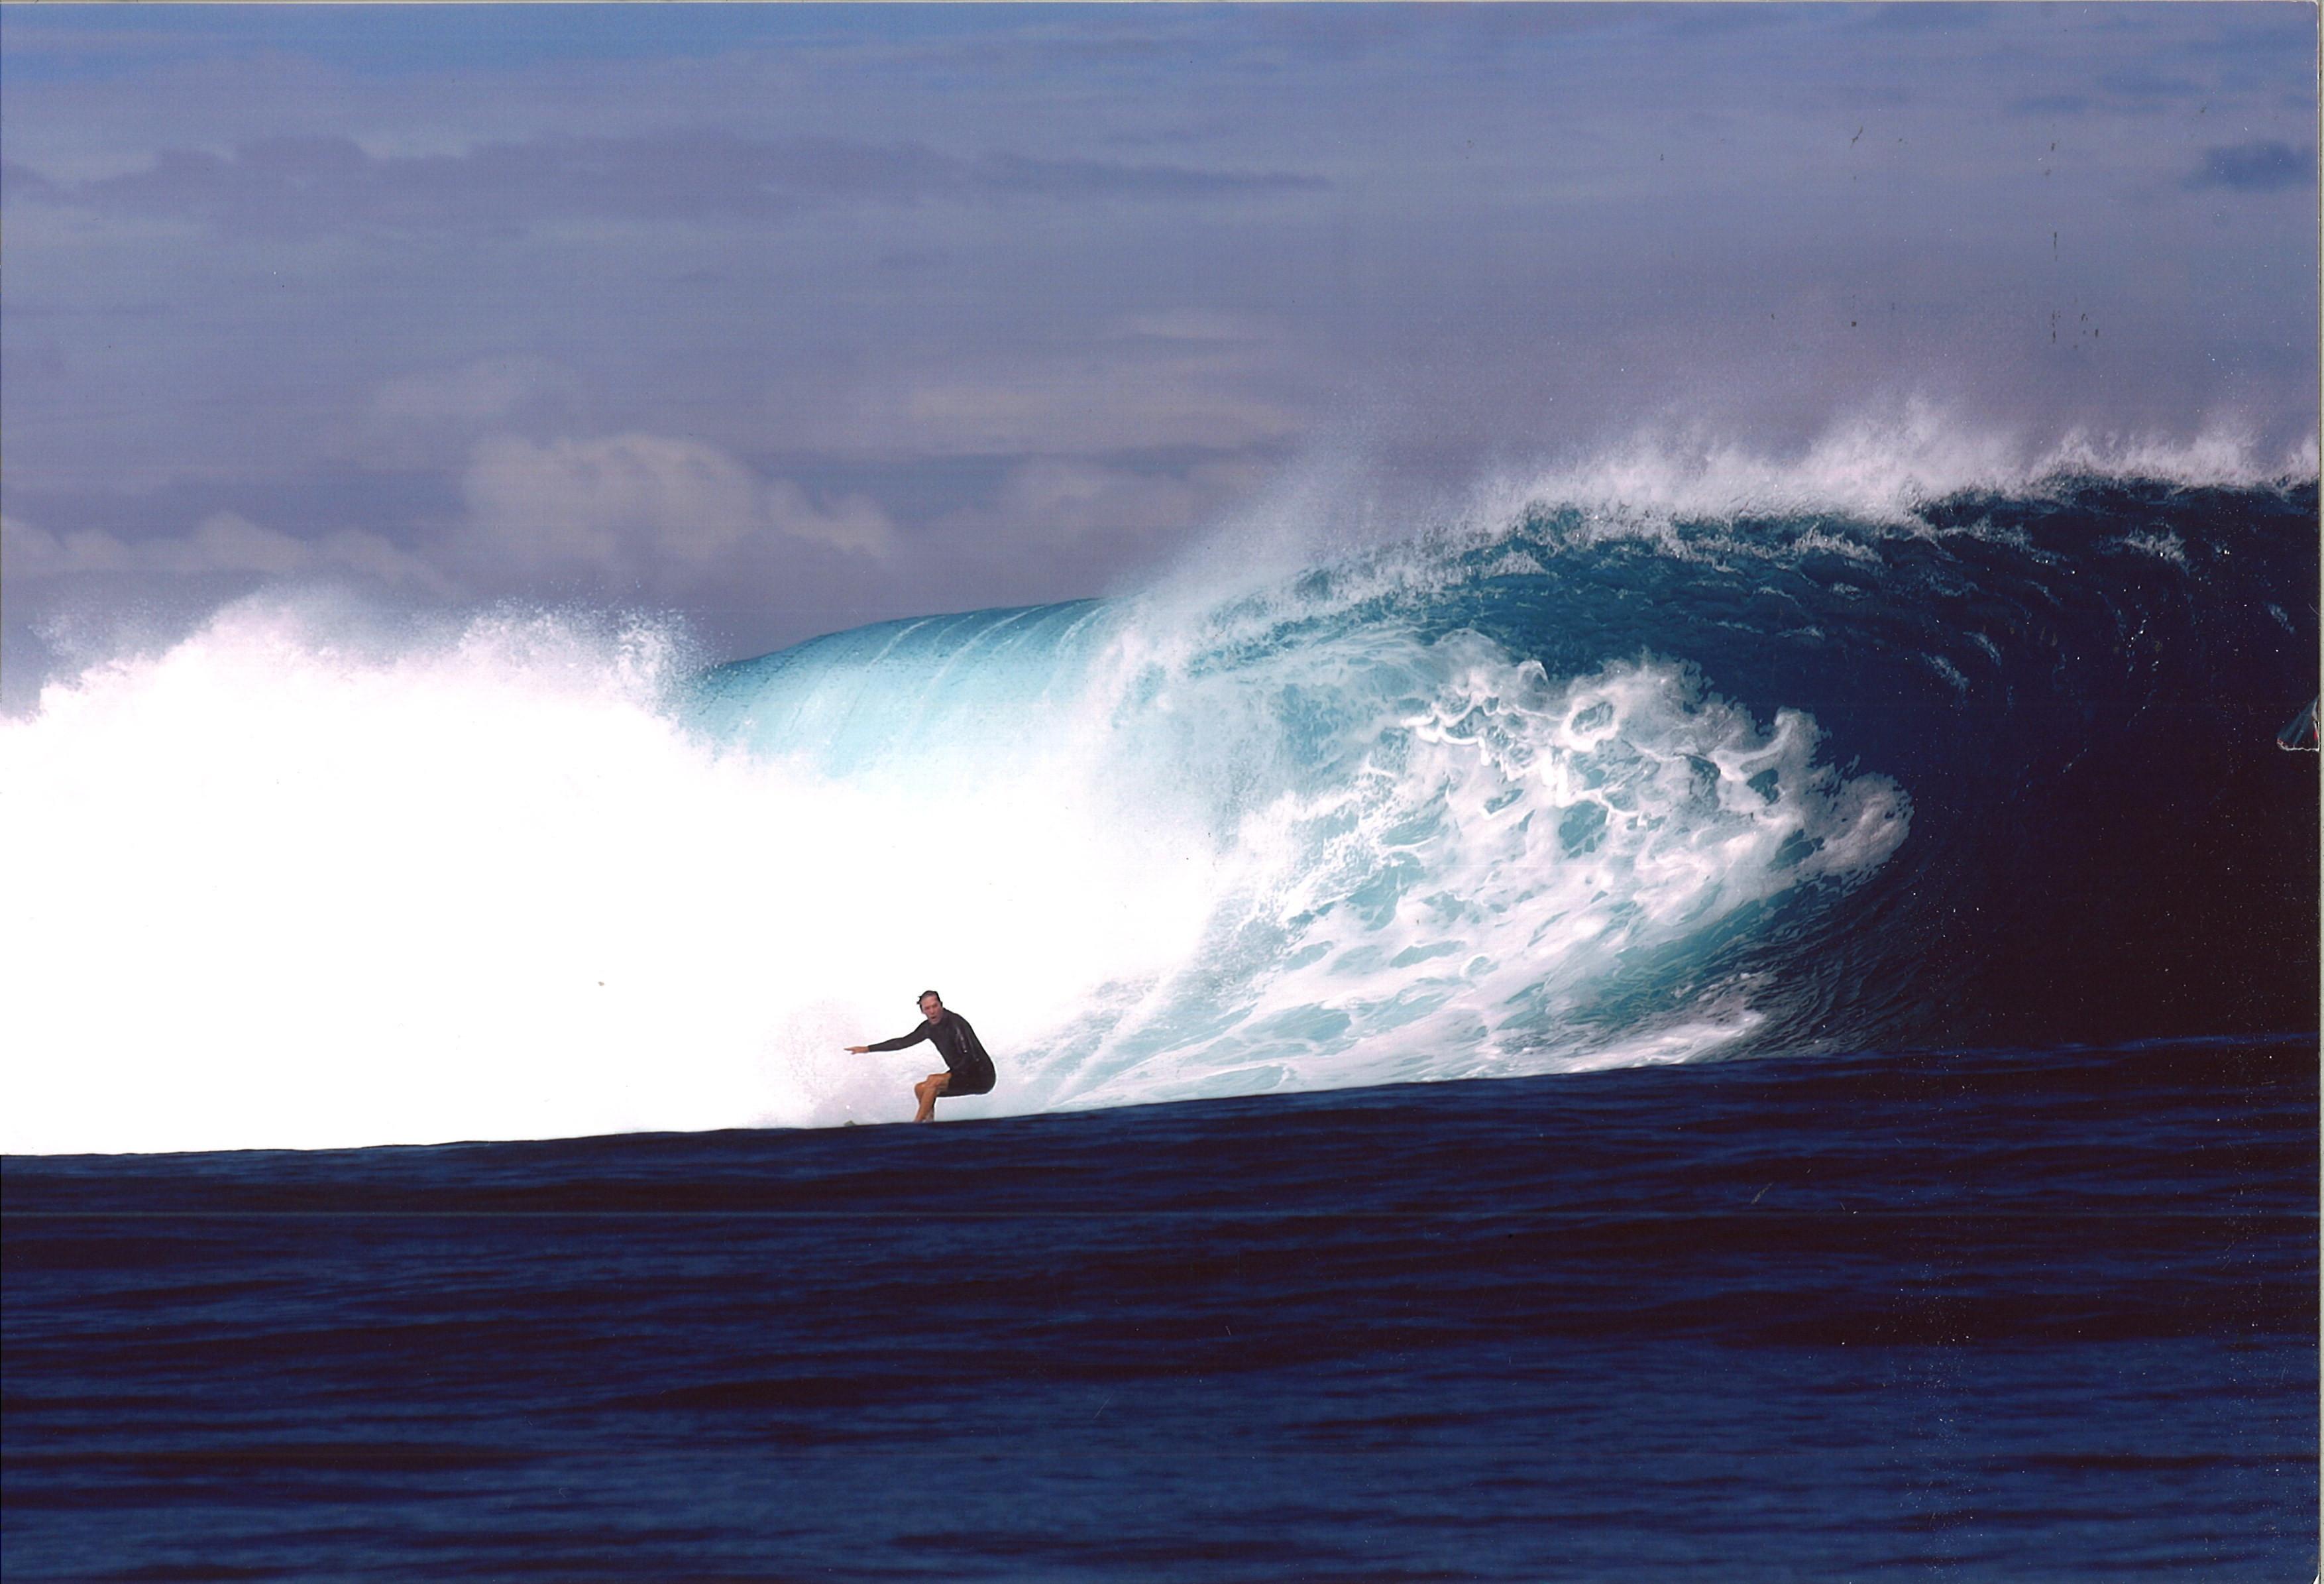 William Finnegan surfs Cloudbreak, off the island of Tavarua in Fiji, in 2005.